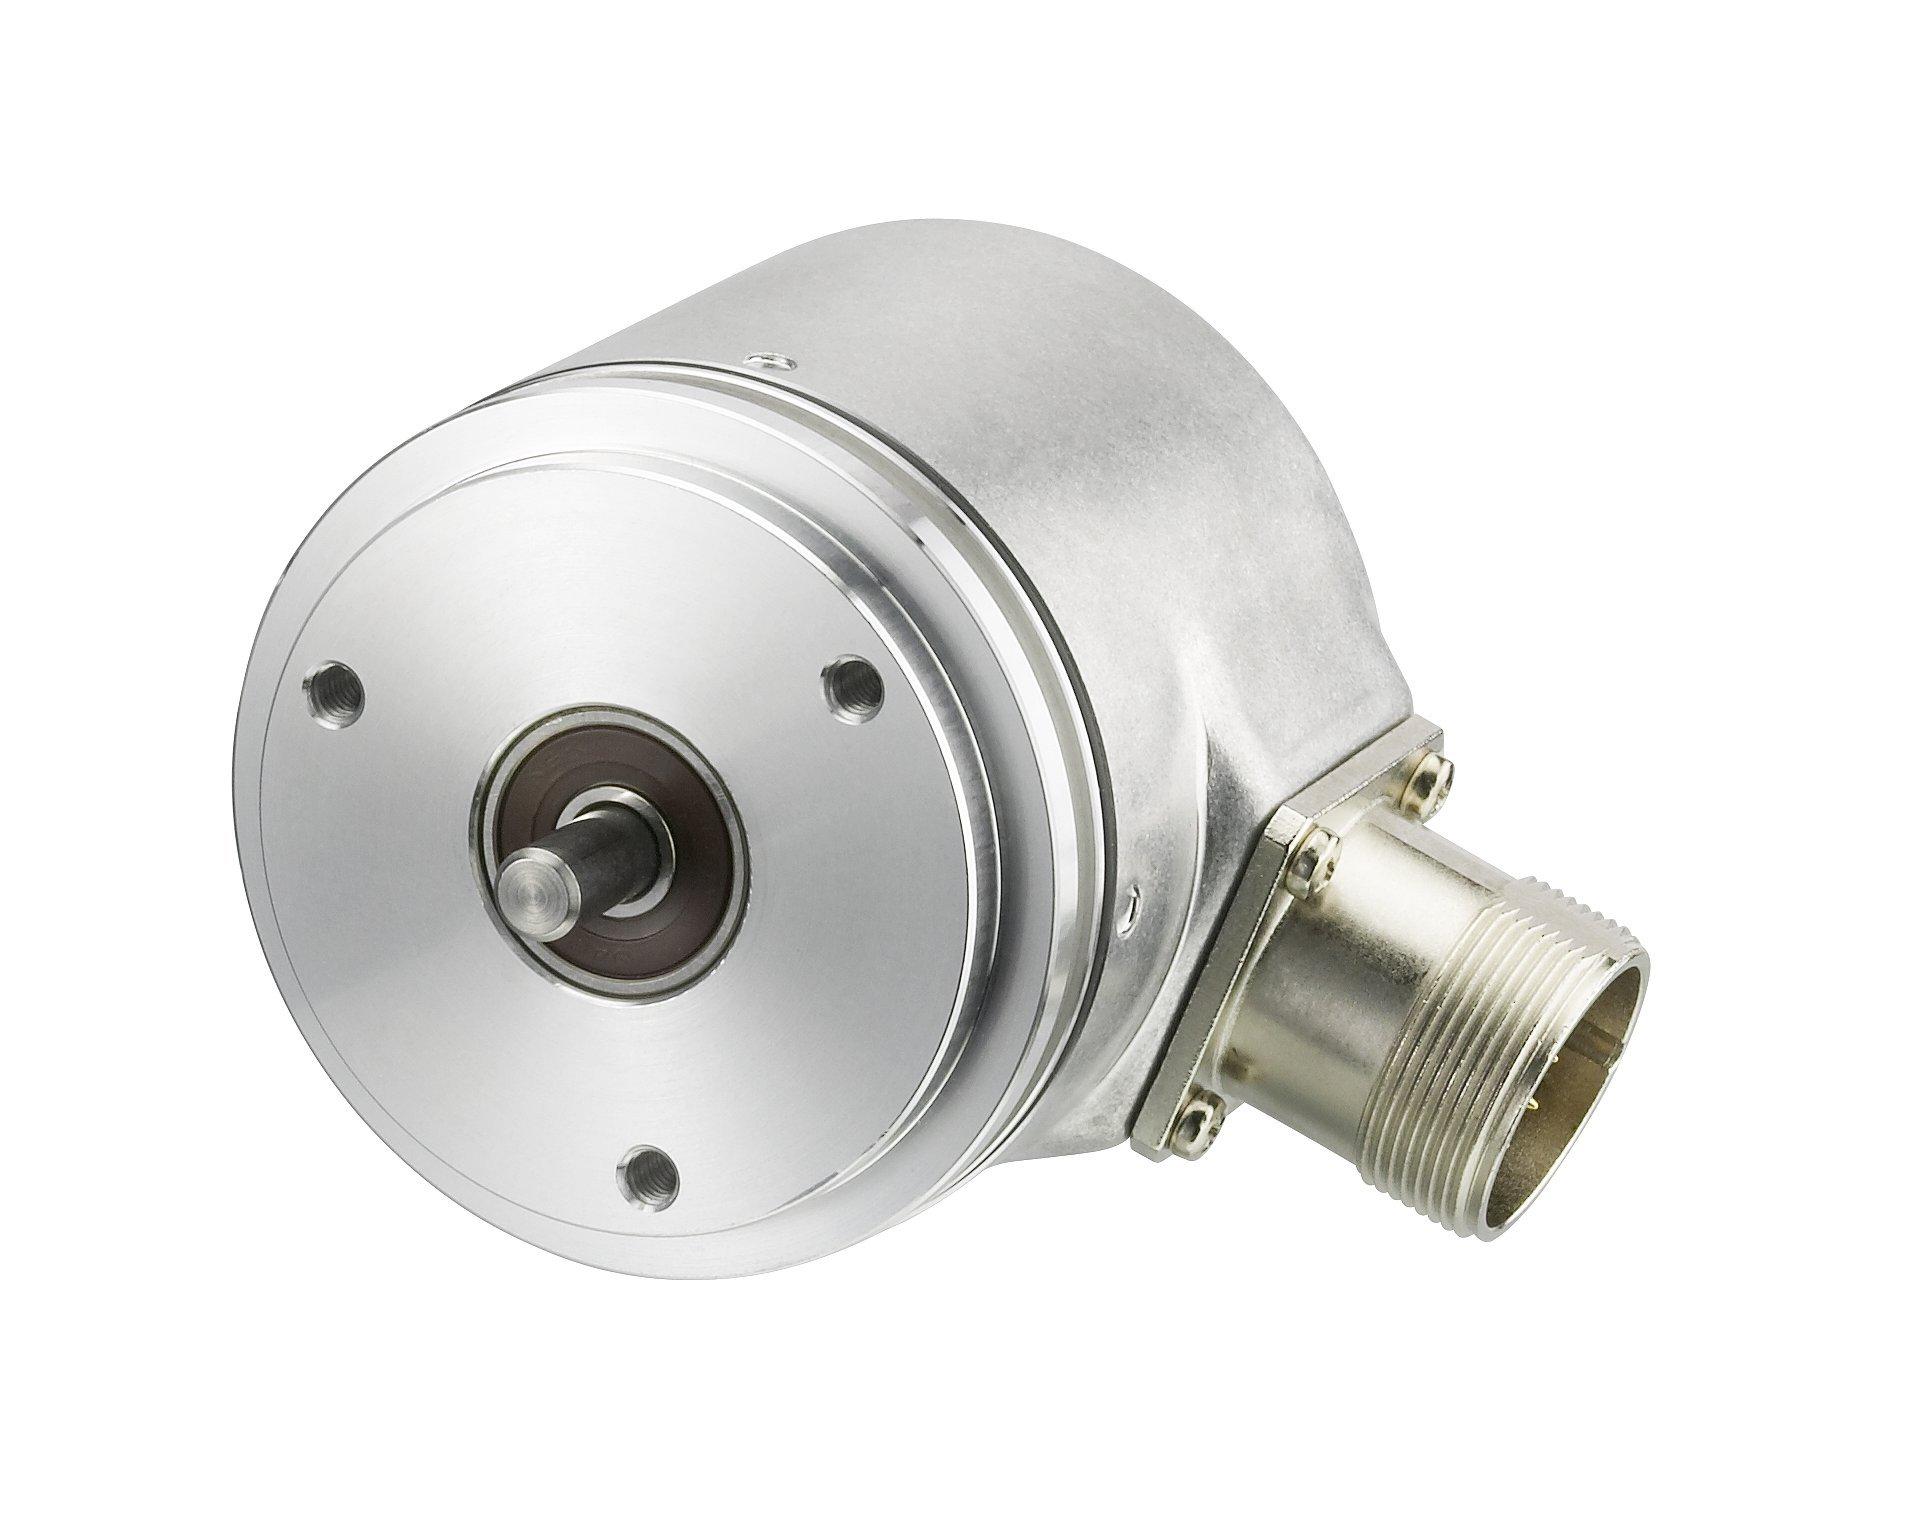 Hengstler 0522333 RI58-O/5000AS.41RD Incremental Encoder, 6 mm Solid Shaft, 5000 Pulses, Grey